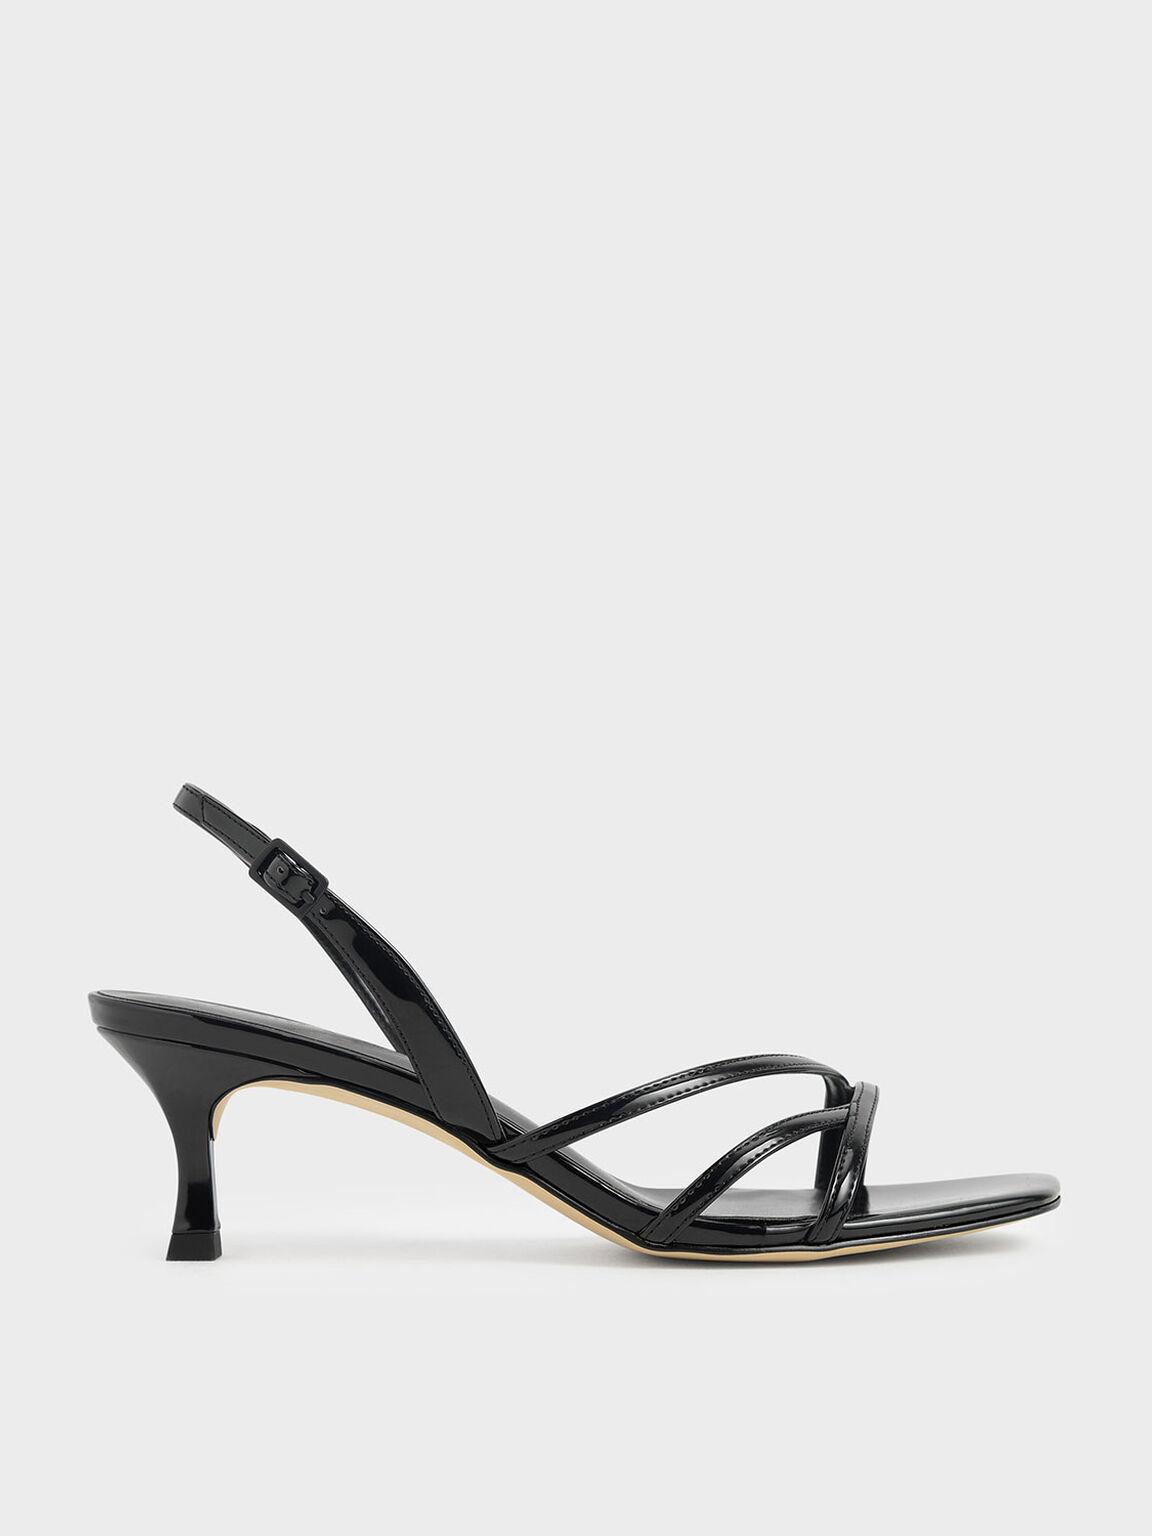 Asymmetric Strappy Patent Heels, Black, hi-res